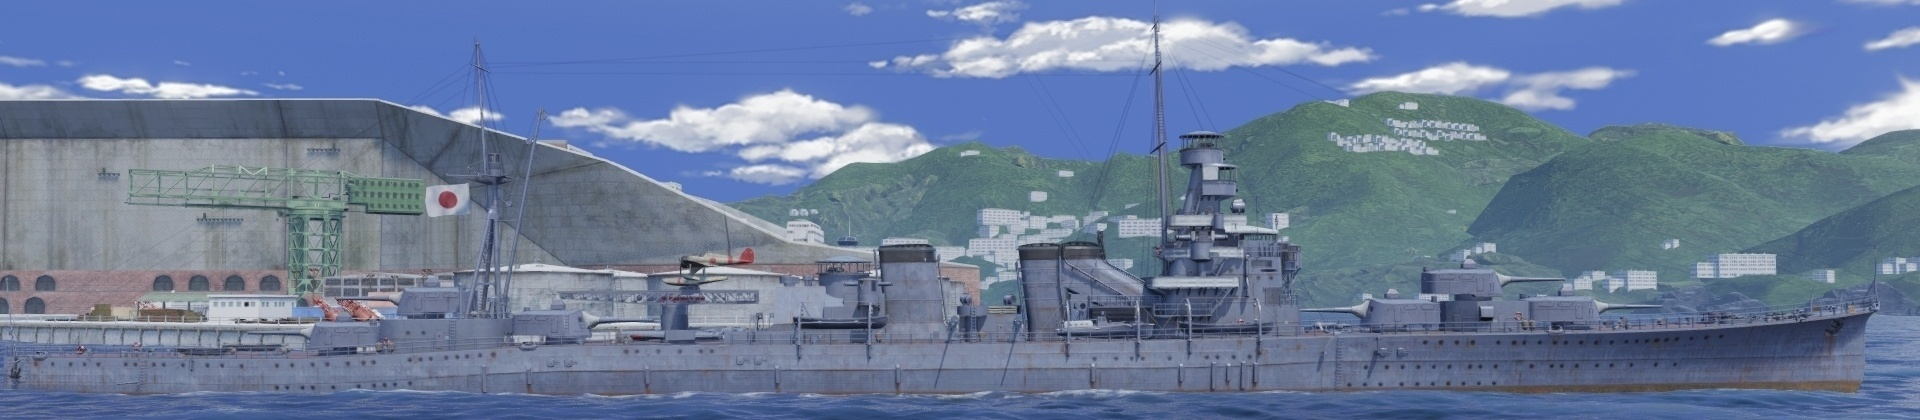 FURUTAKA view.jpg